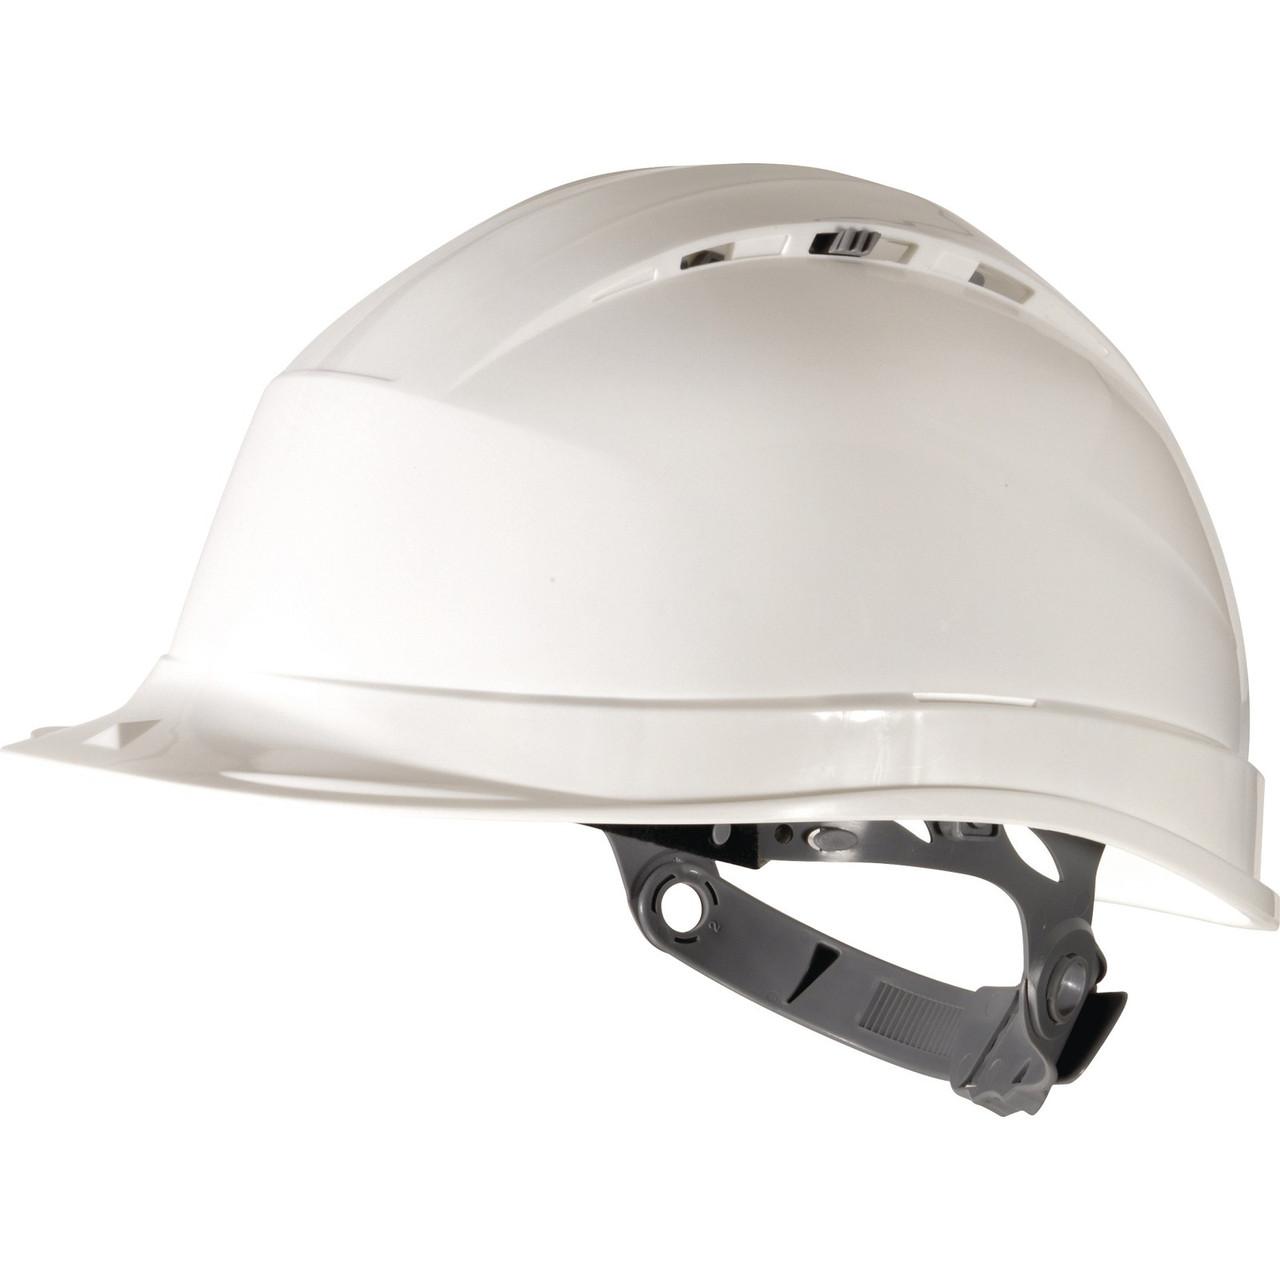 Каска защитная с вентиляцией Delta QUARTZ I белая